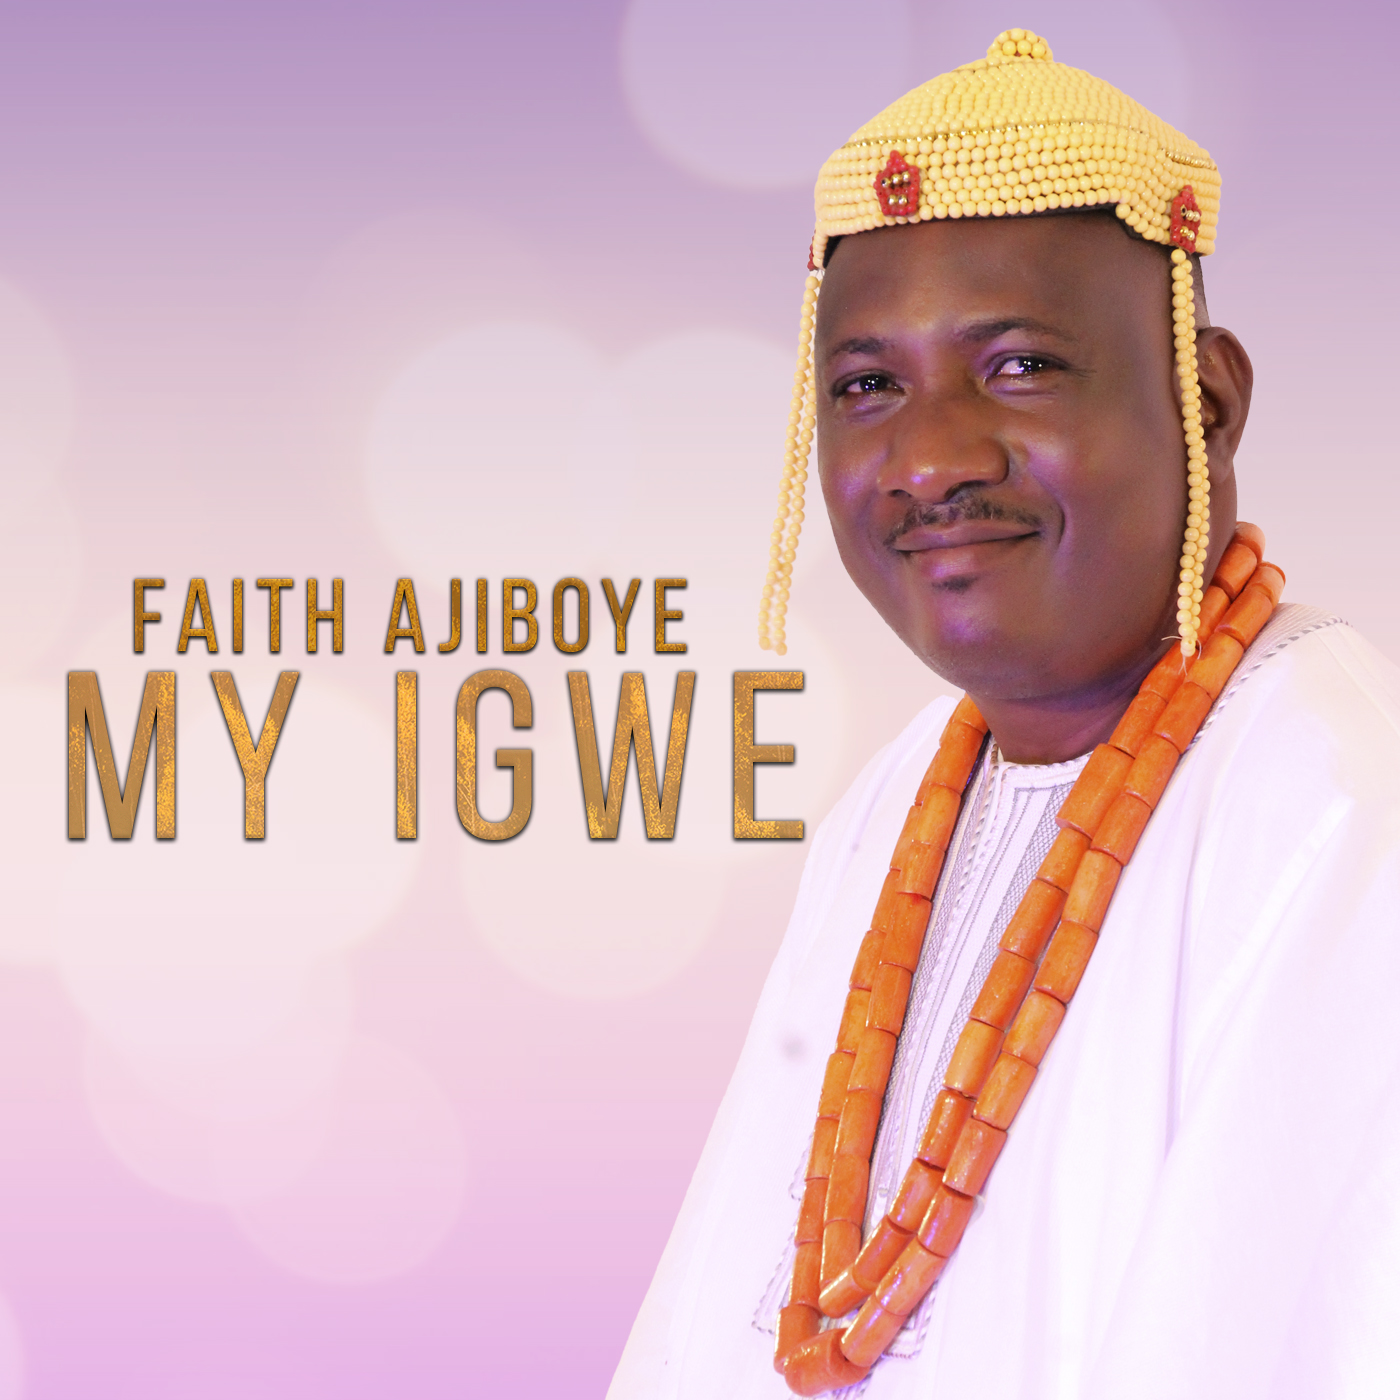 My Igwe - Faith Ajiboye